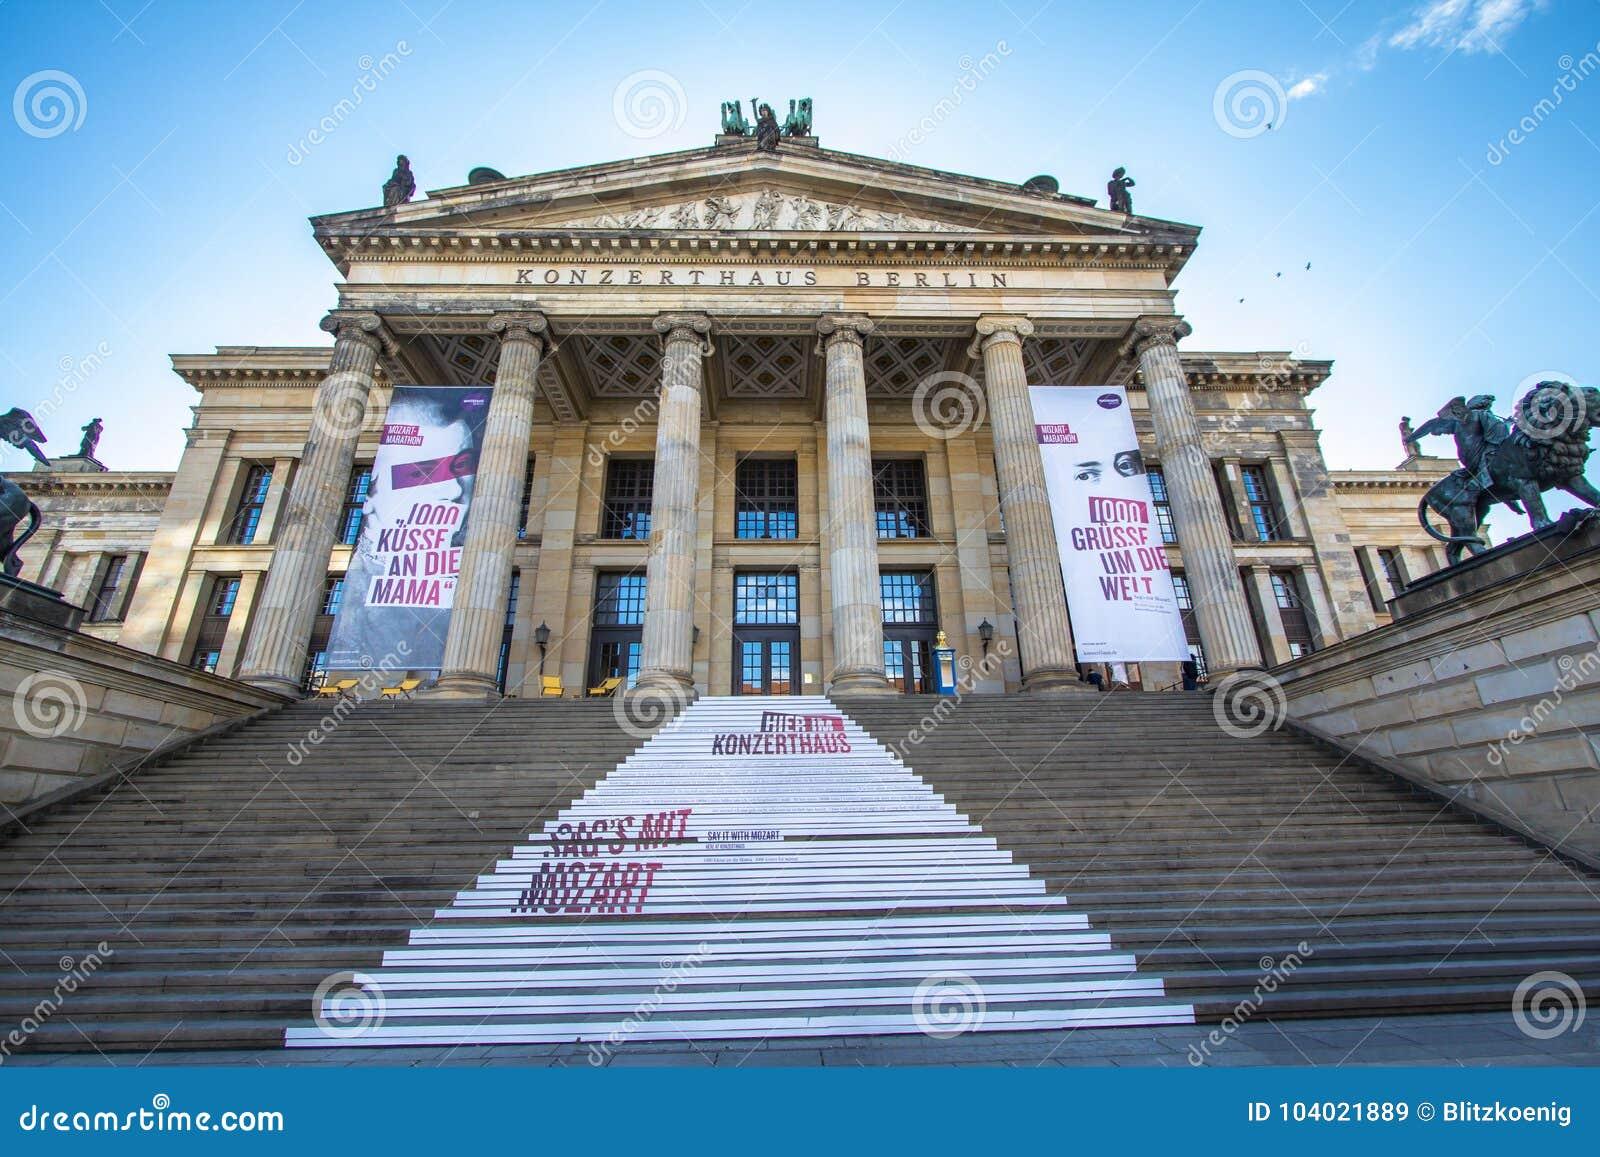 Konzerthaus, Berlijn, Duitsland